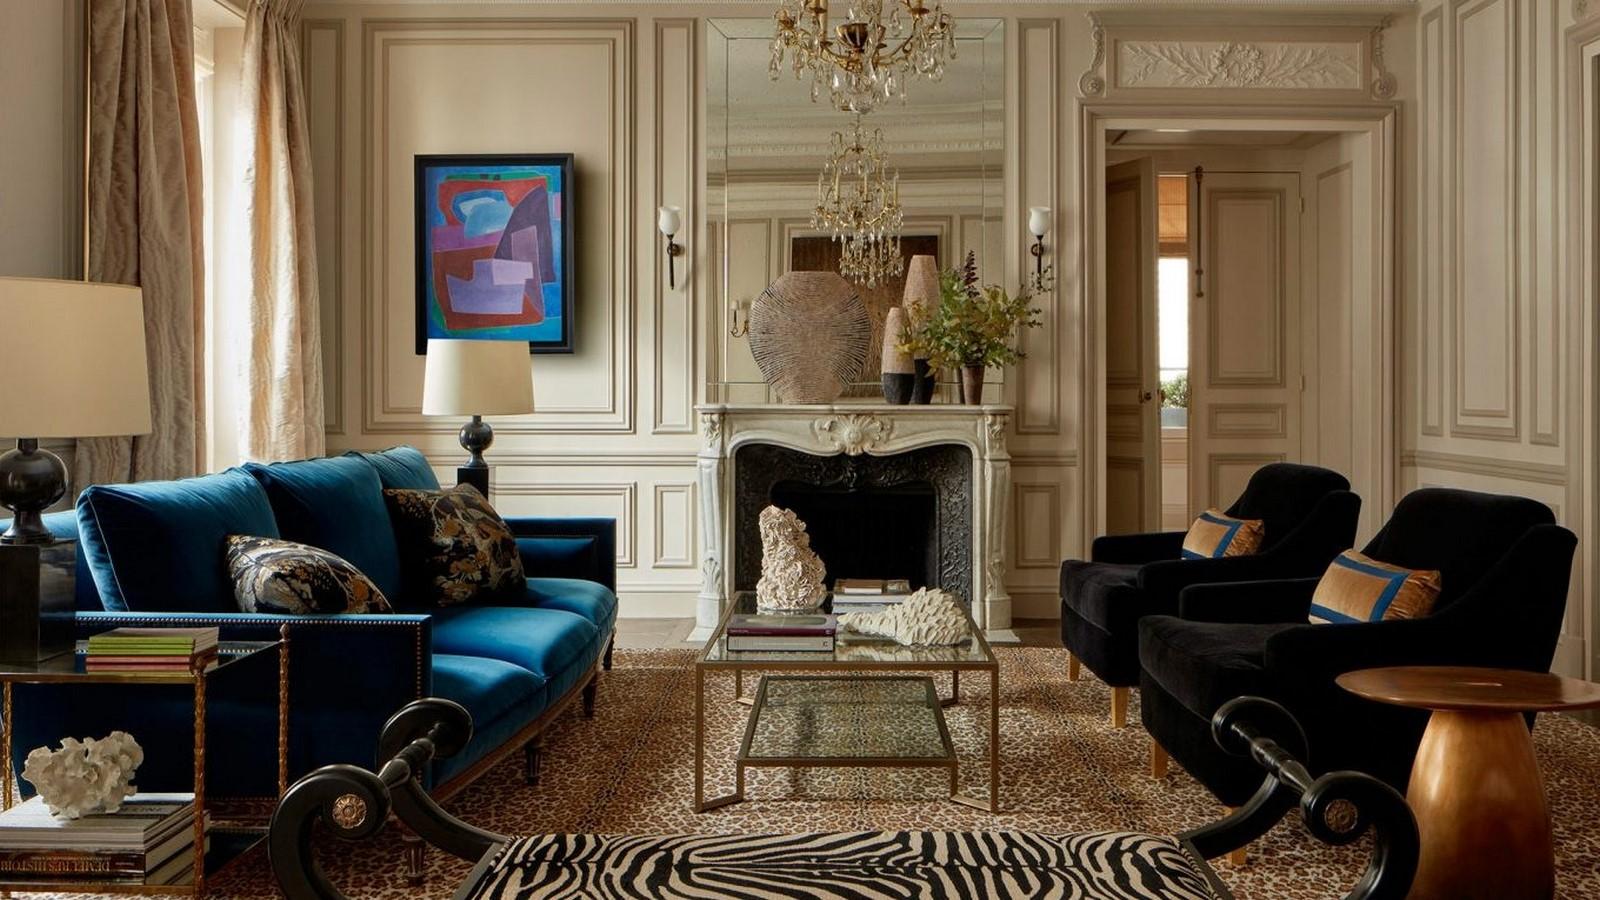 15 beautiful vintage apartments around the world - Sheet9